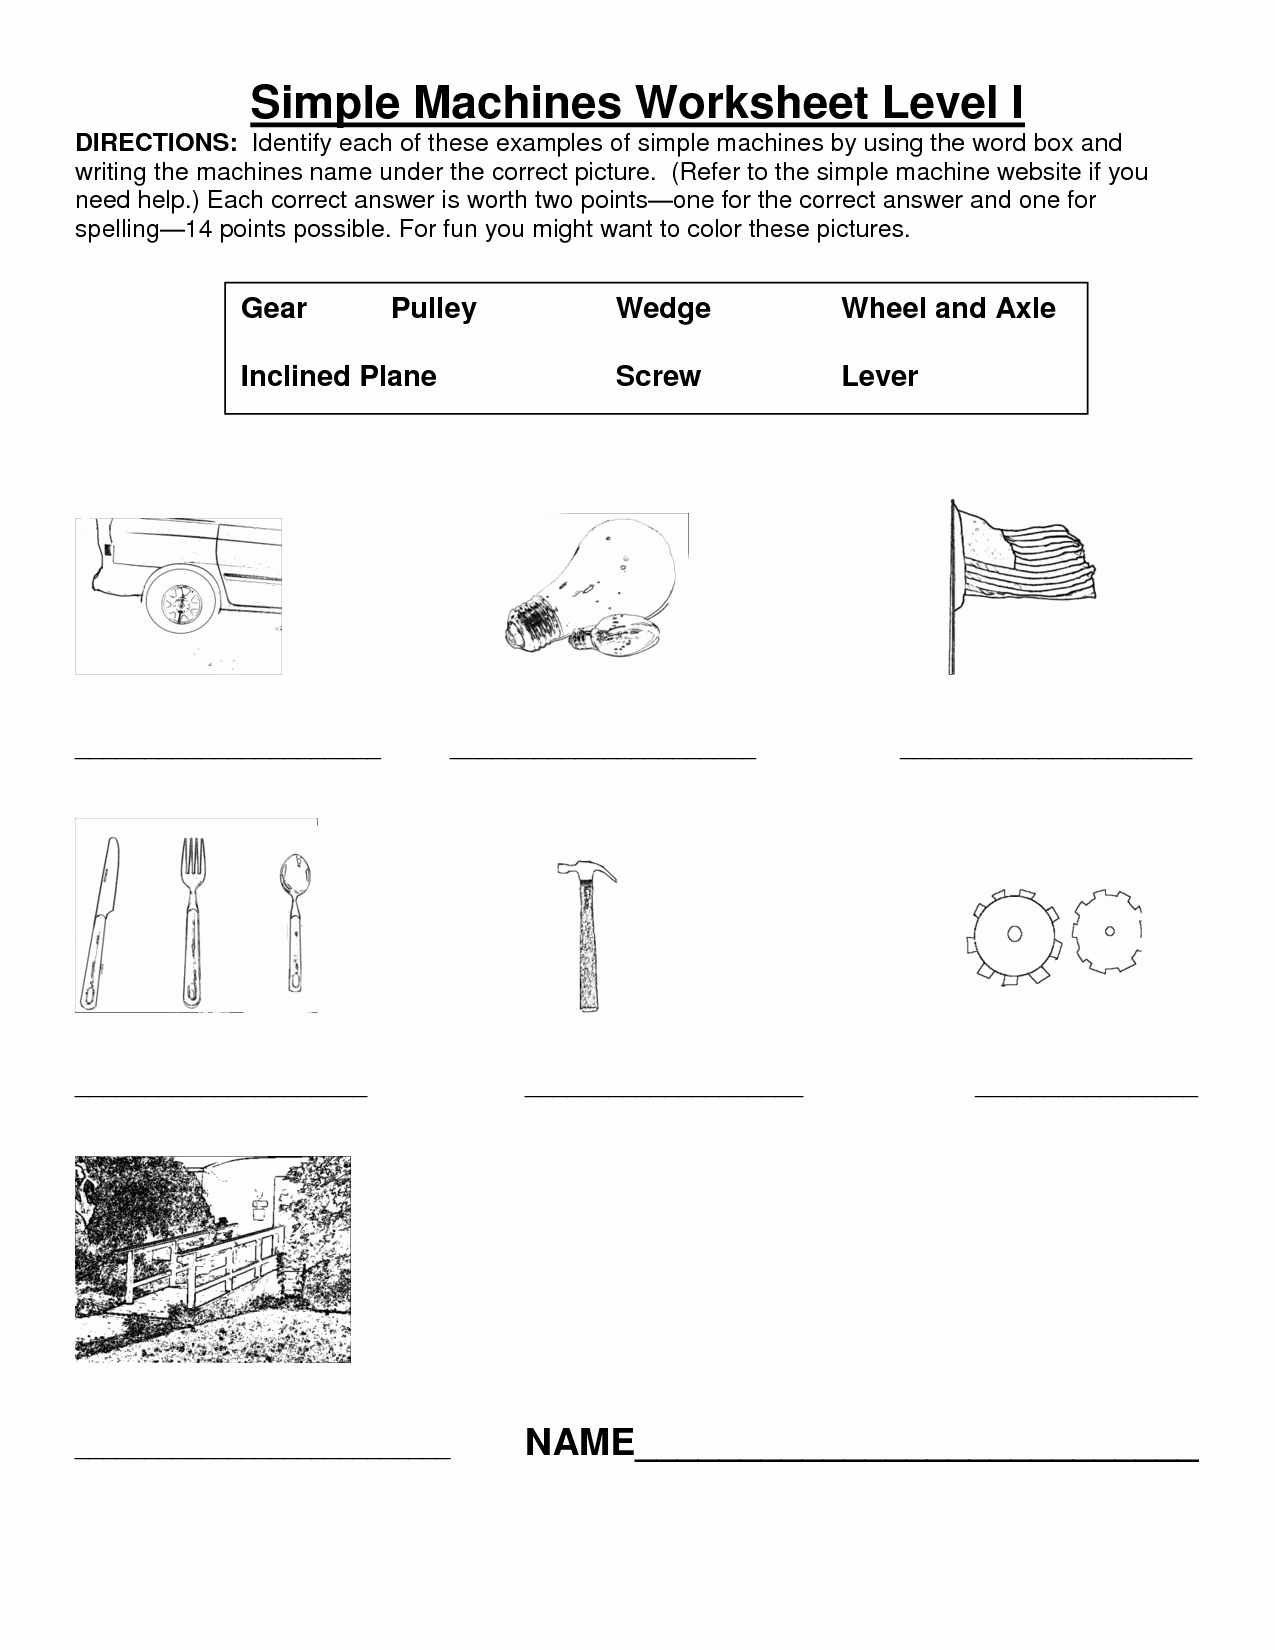 Simple Machines Worksheet Answers Lovely 14 Best Of Types Energy Worksheet Elementary